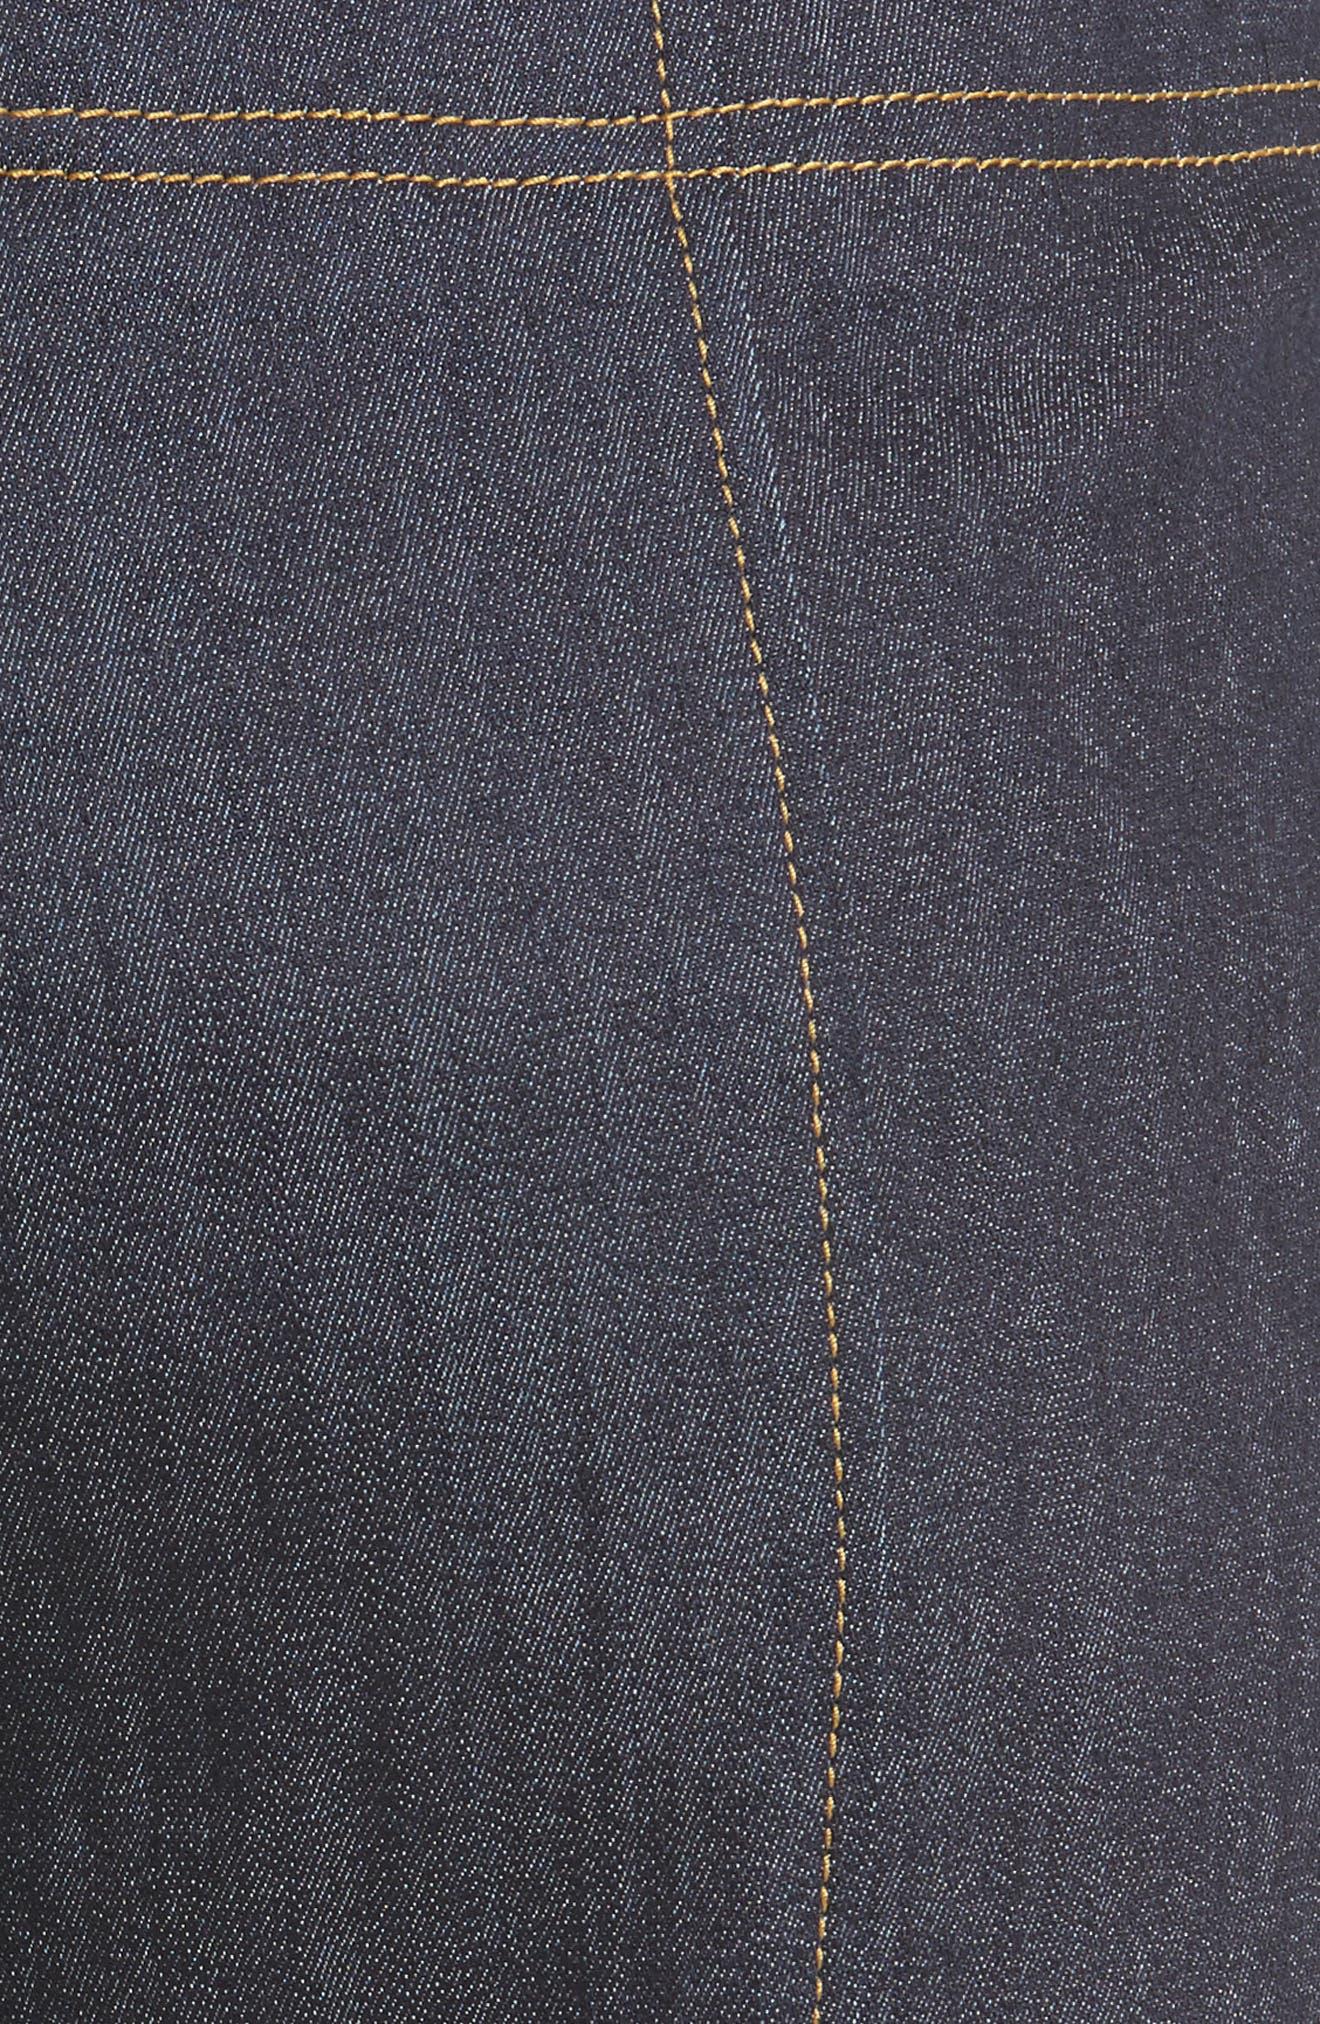 Marla Cuff Jeans,                             Alternate thumbnail 6, color,                             Indigo